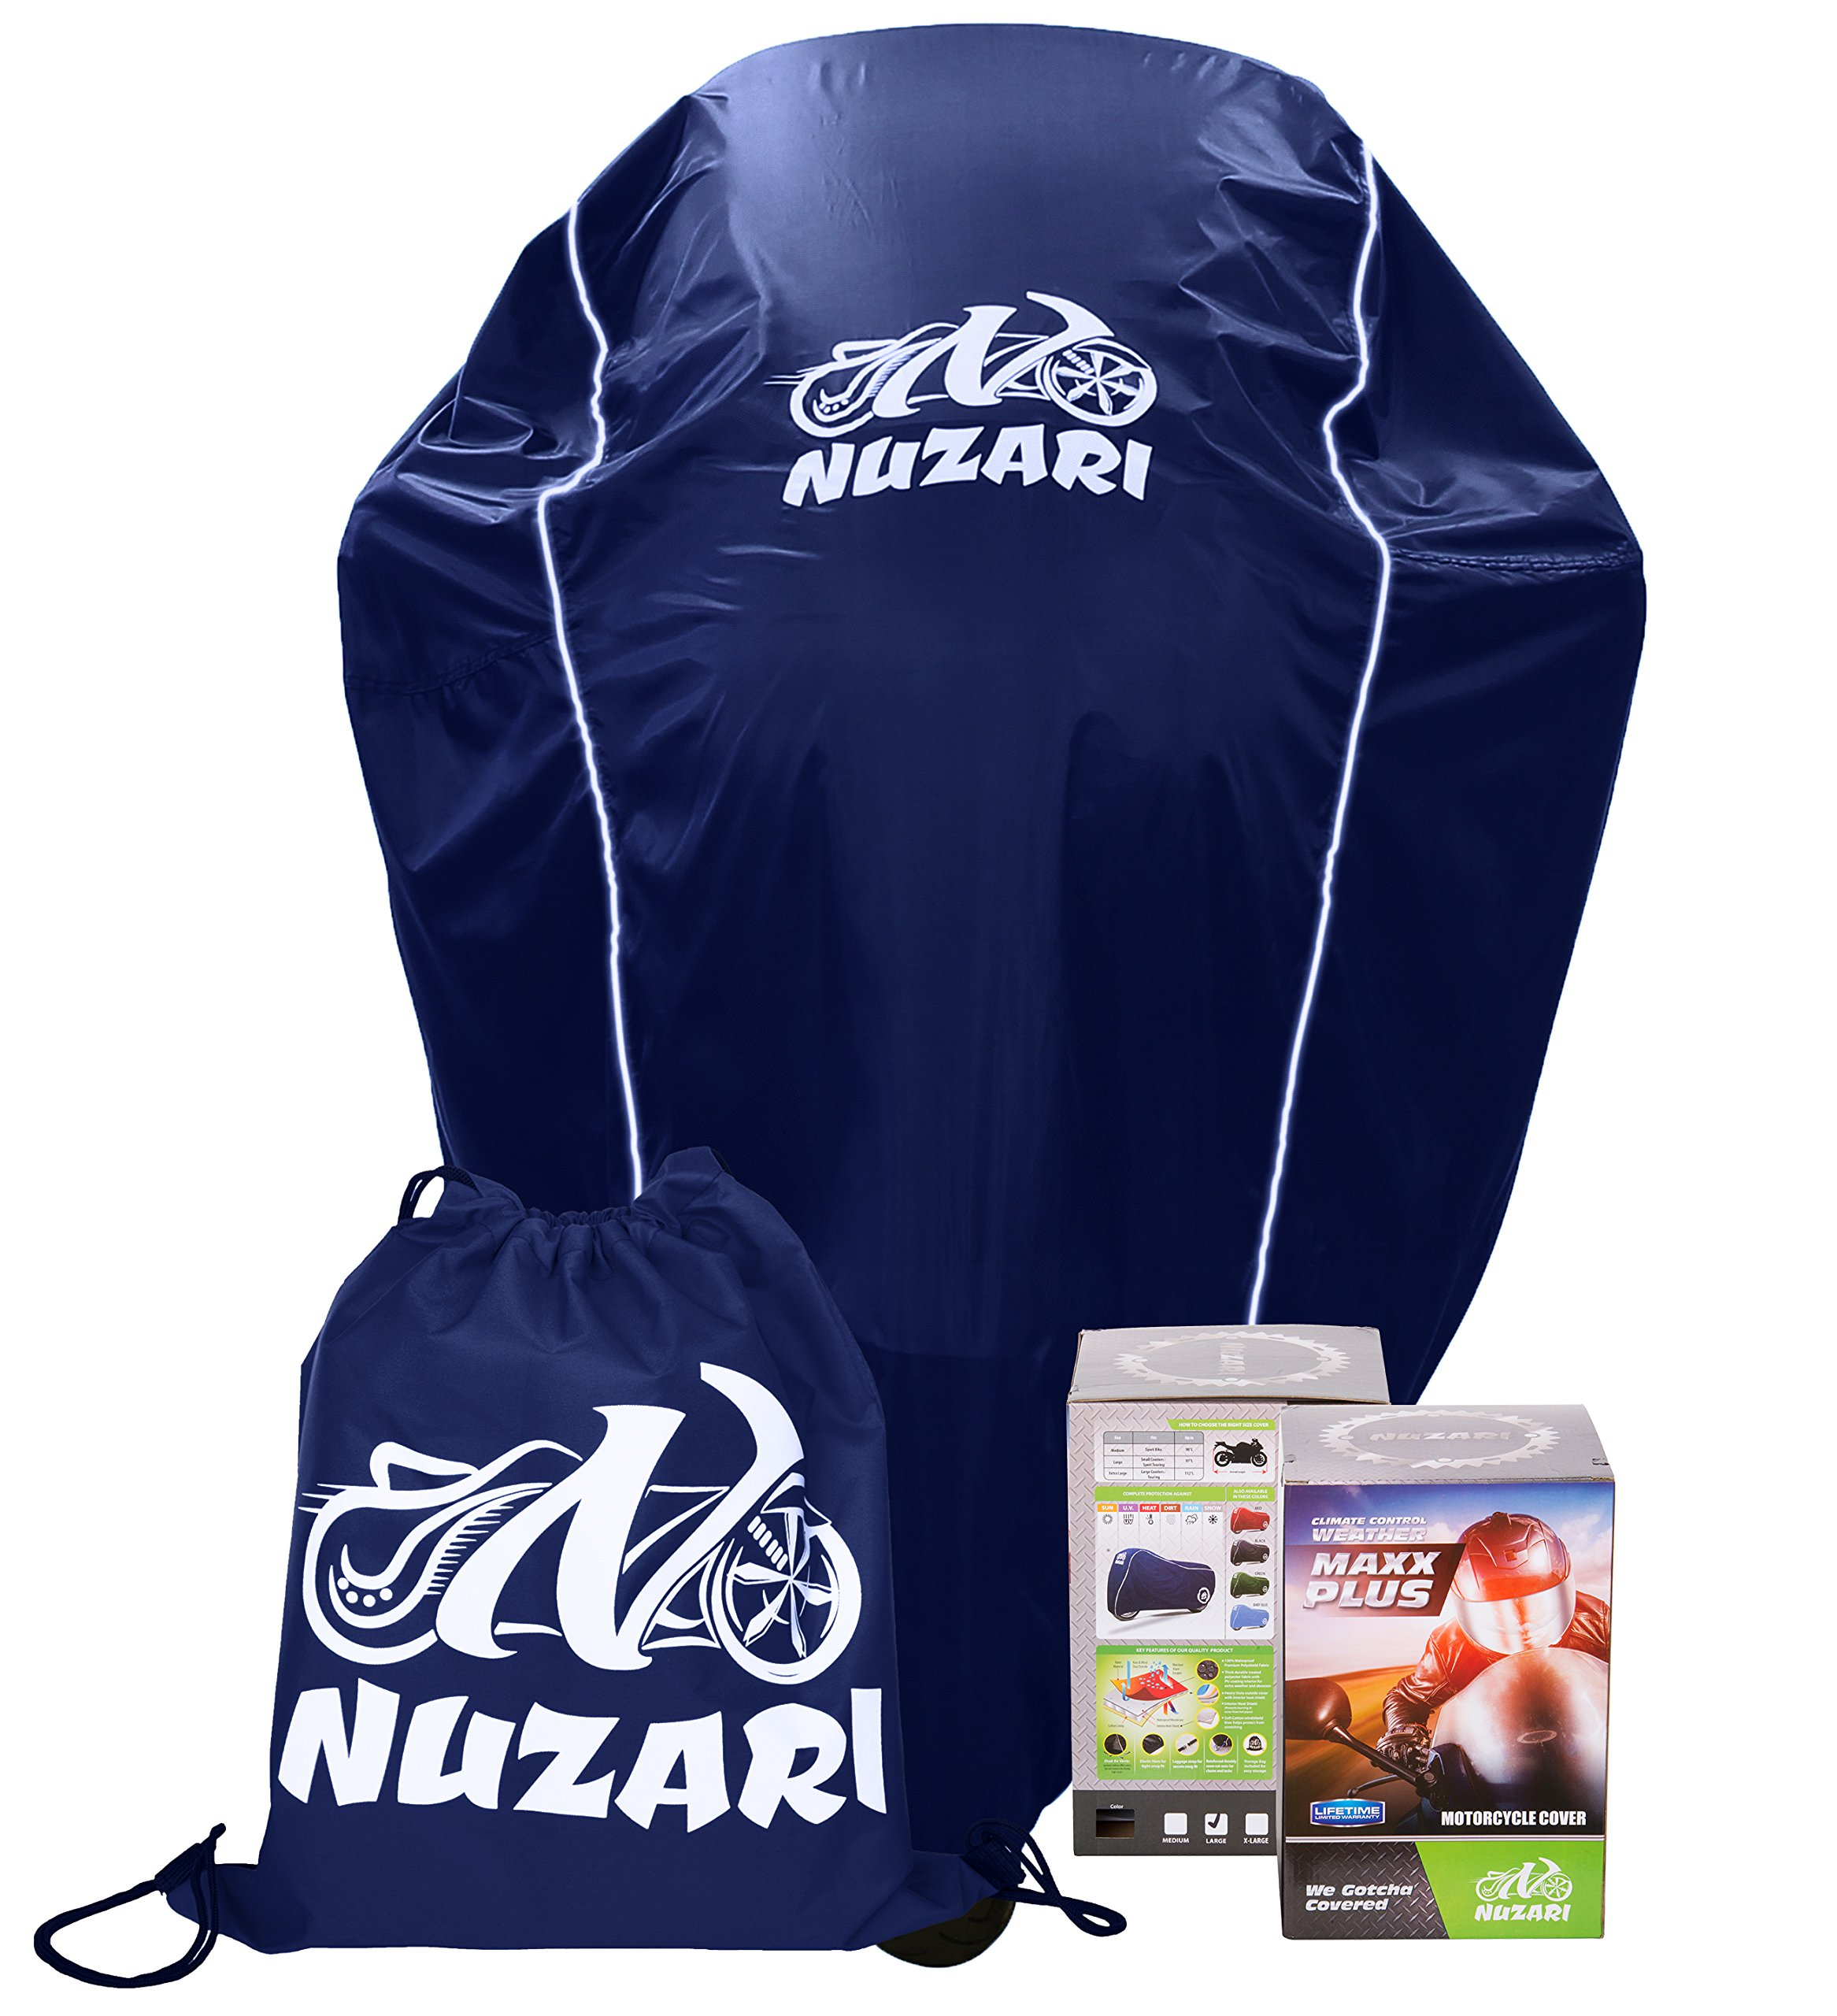 dcba4a23ef16 Amazon.com  Nuzari Waterproof Polyester Outdoor Motorcycle Cover ...